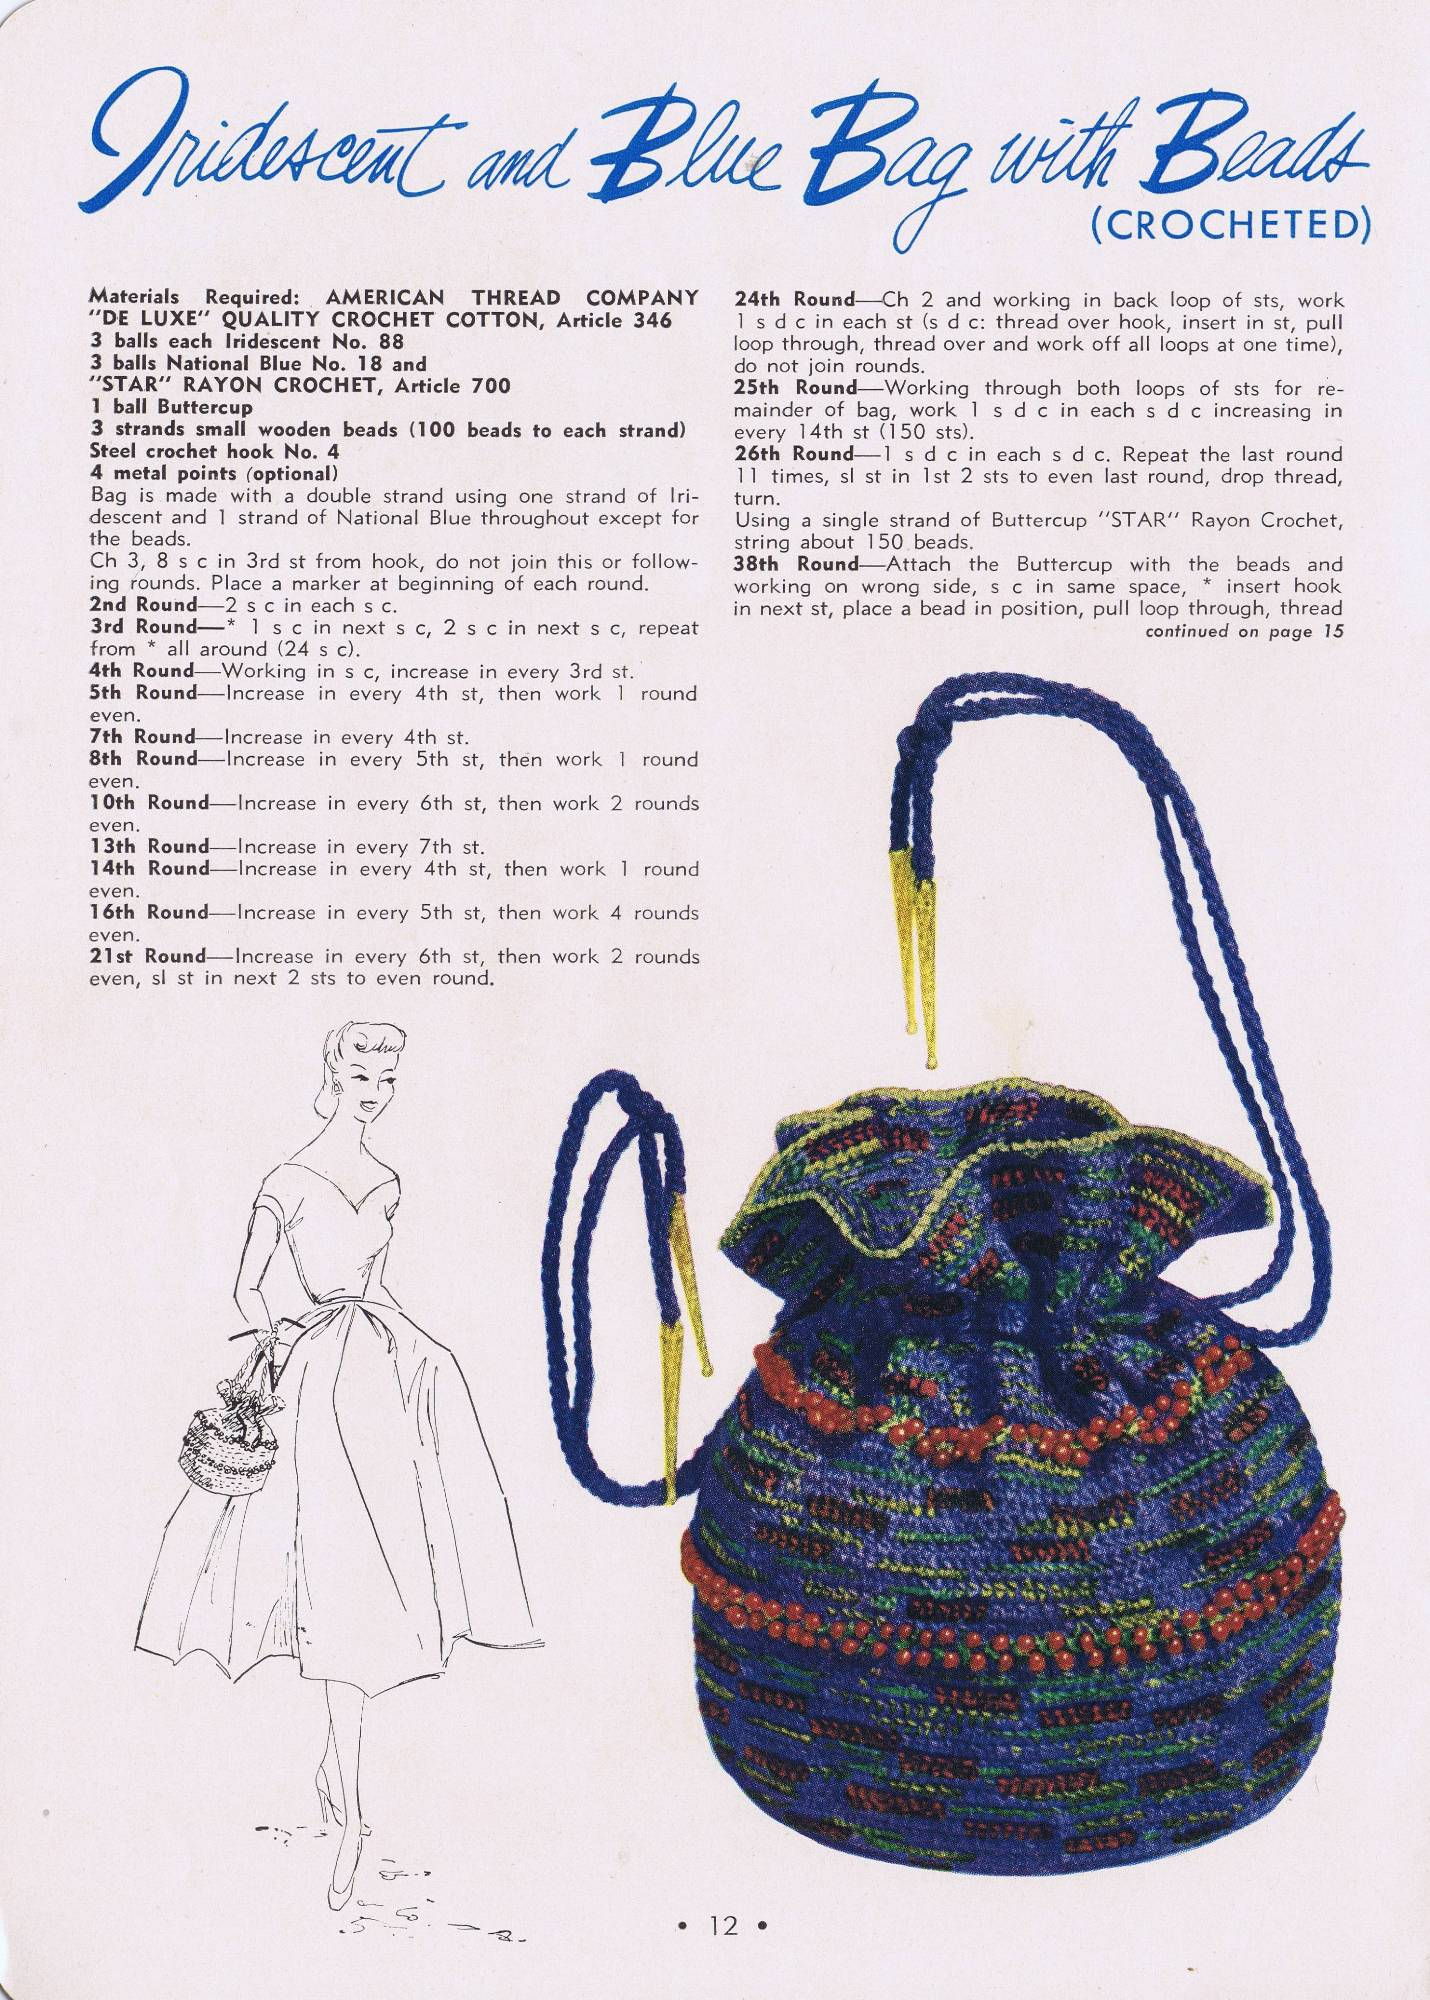 Free Vintage Crochet Hat And Bag Patterns